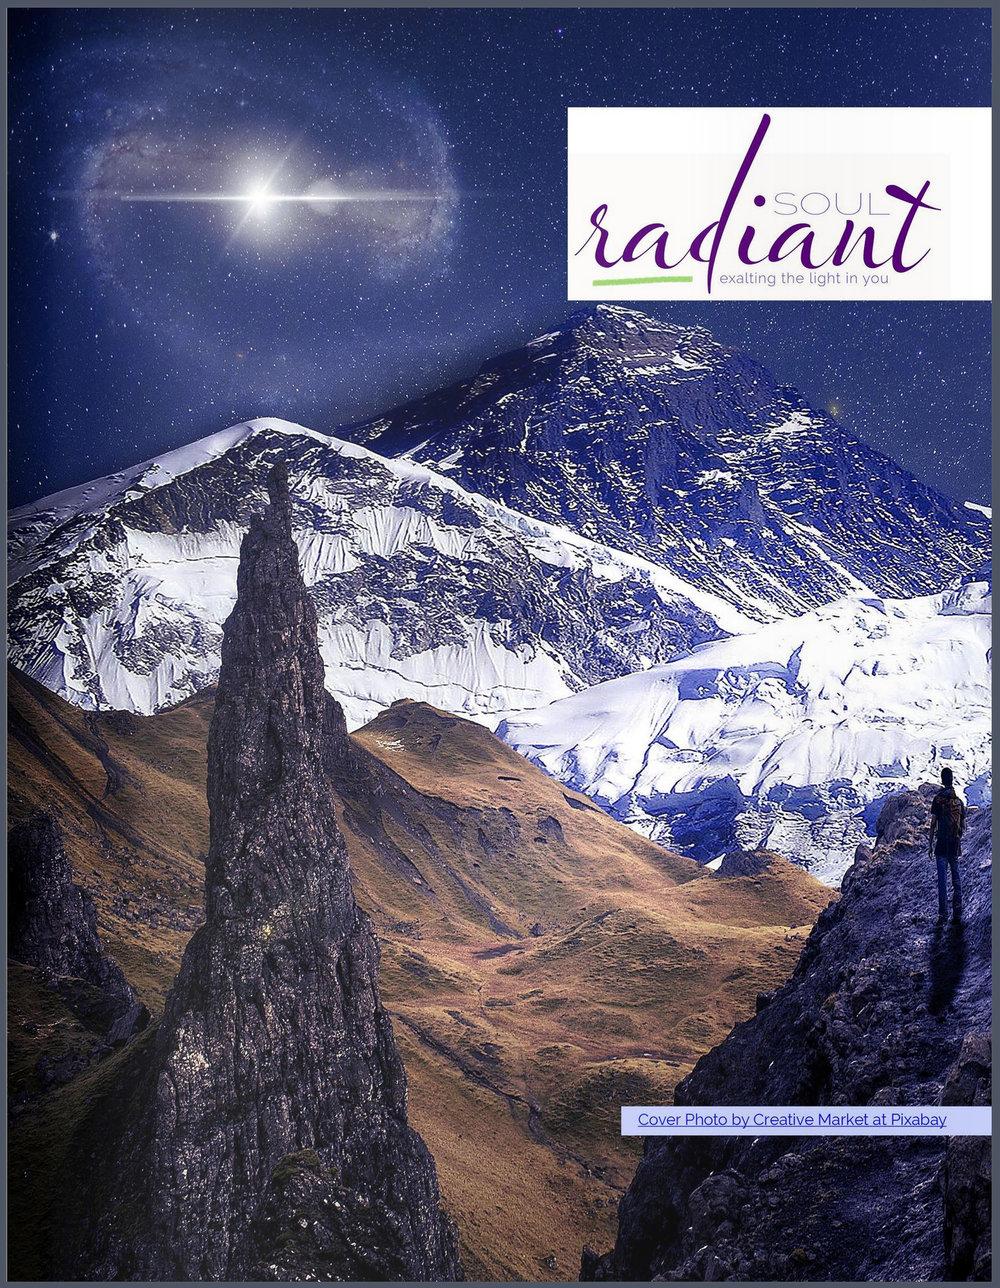 radiant-soul-magazine-starseeds-indigos.jpg